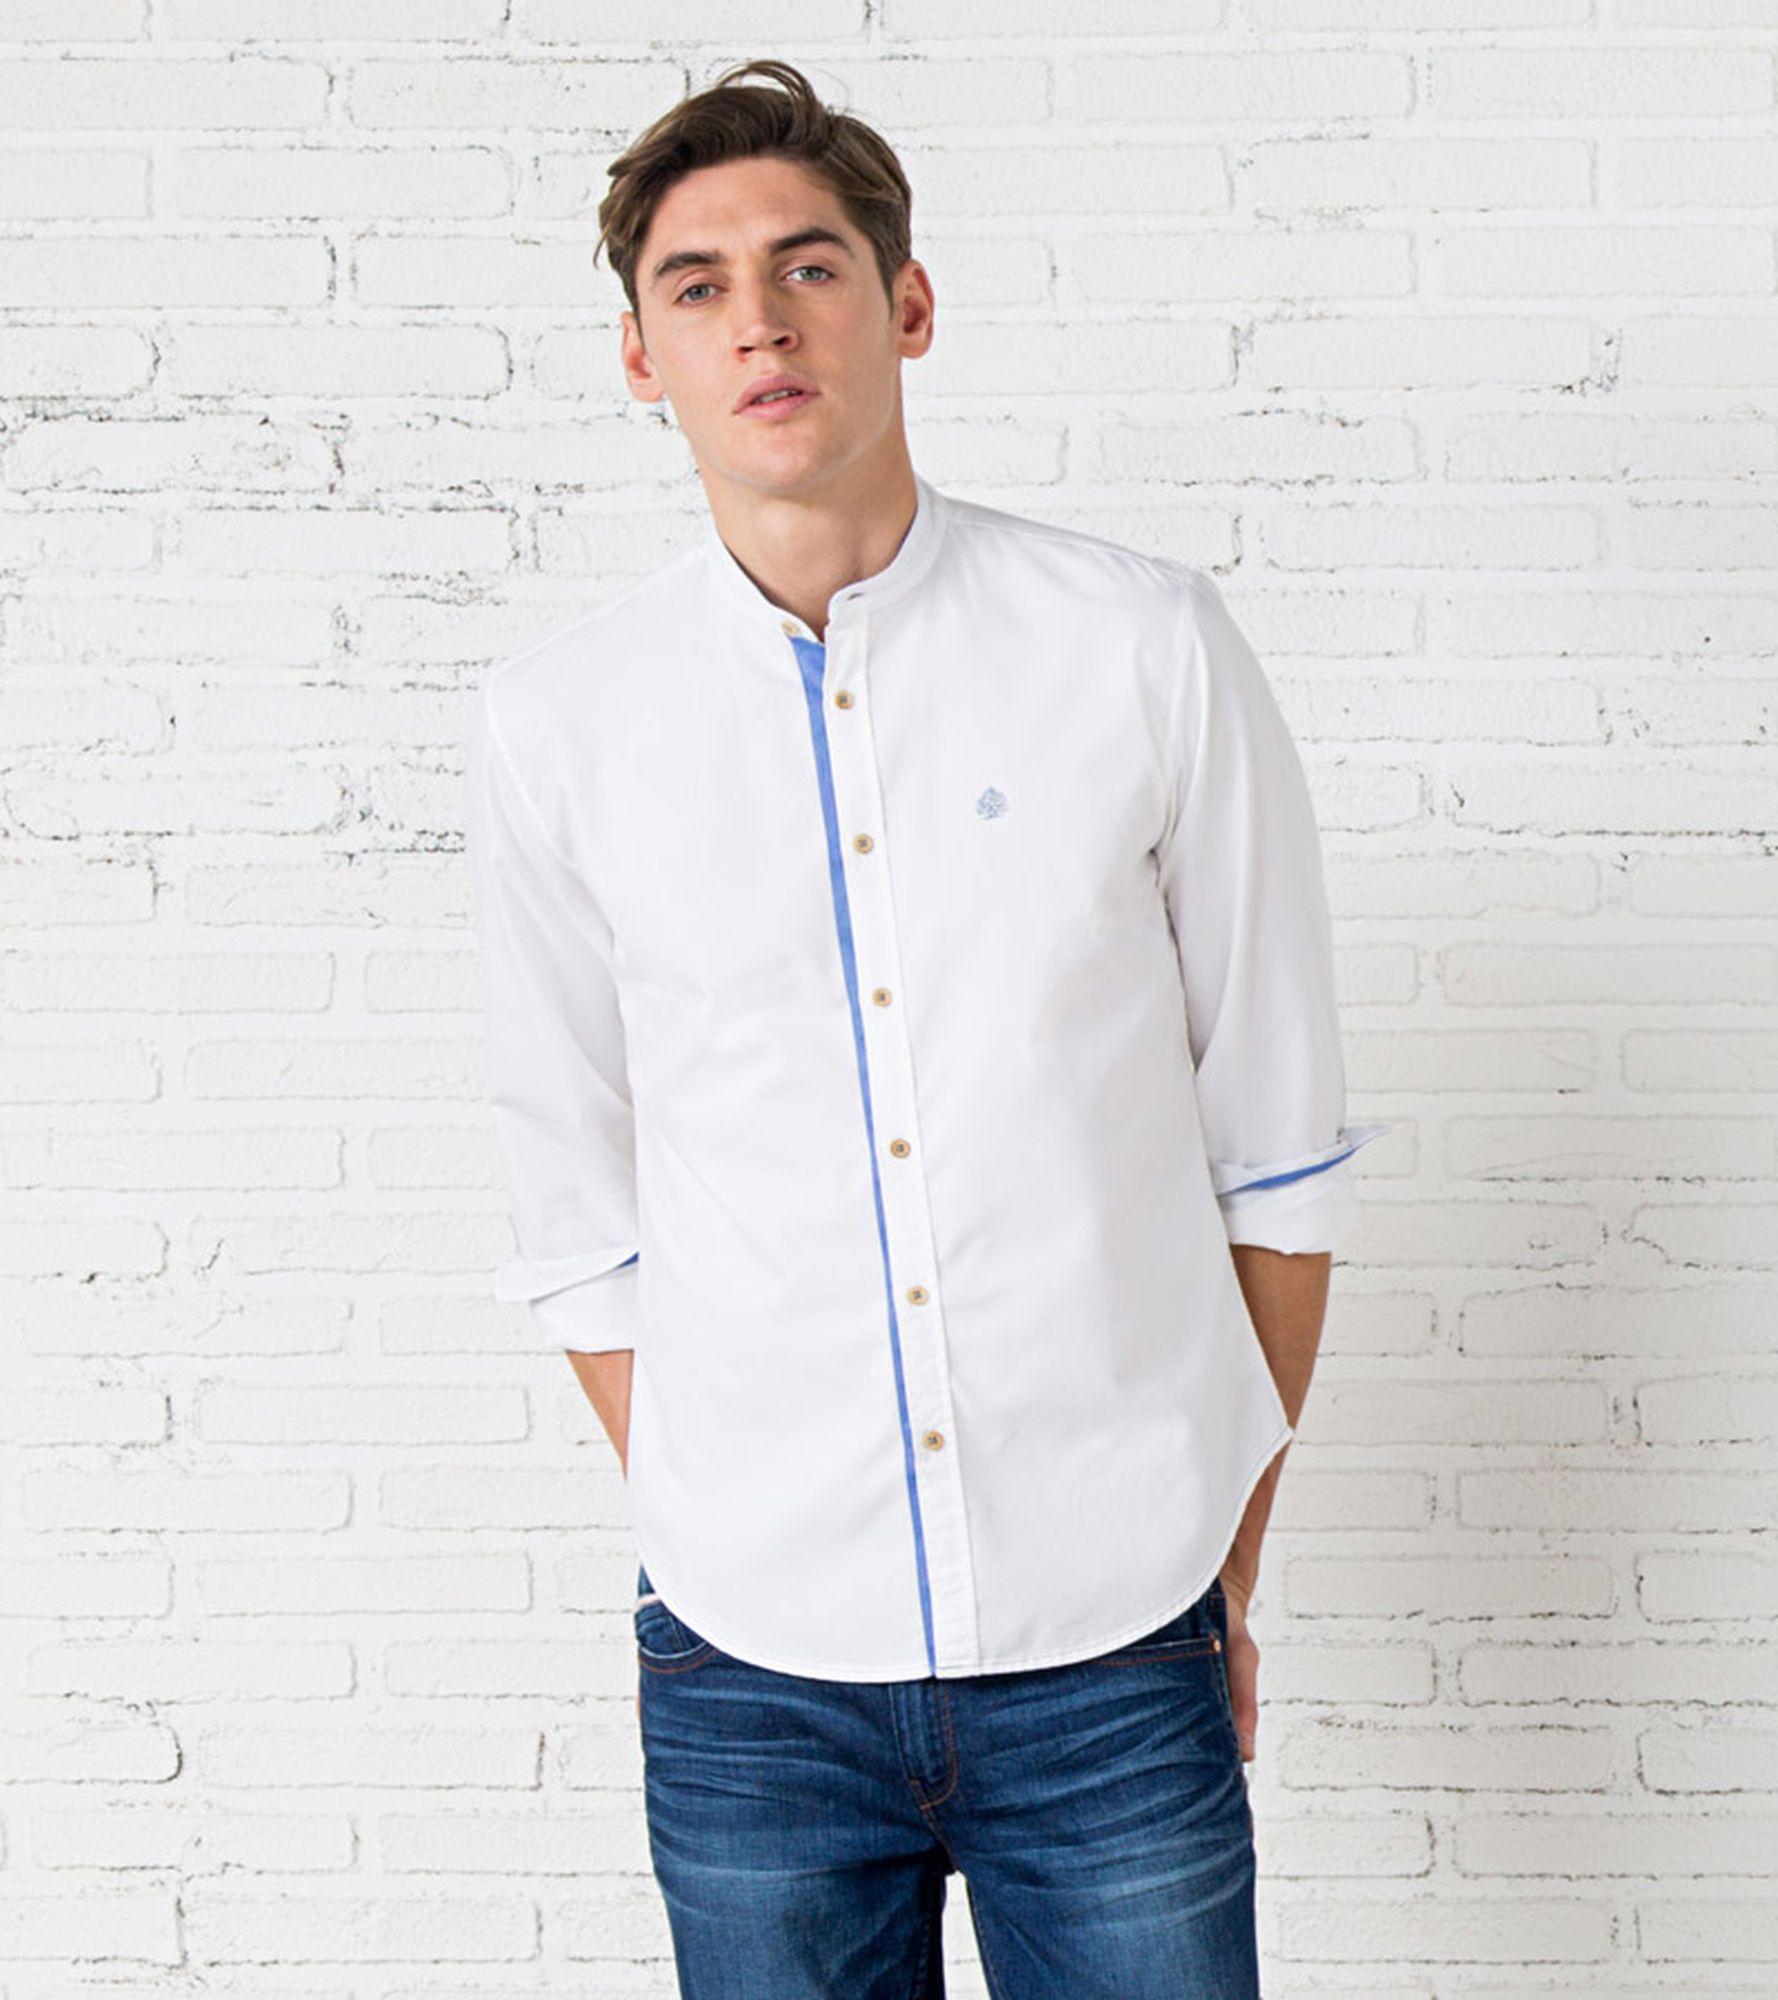 Zara flannel shirt mens  Pin by Dorothea Nimfа on Superio  Pinterest  Casual shirts